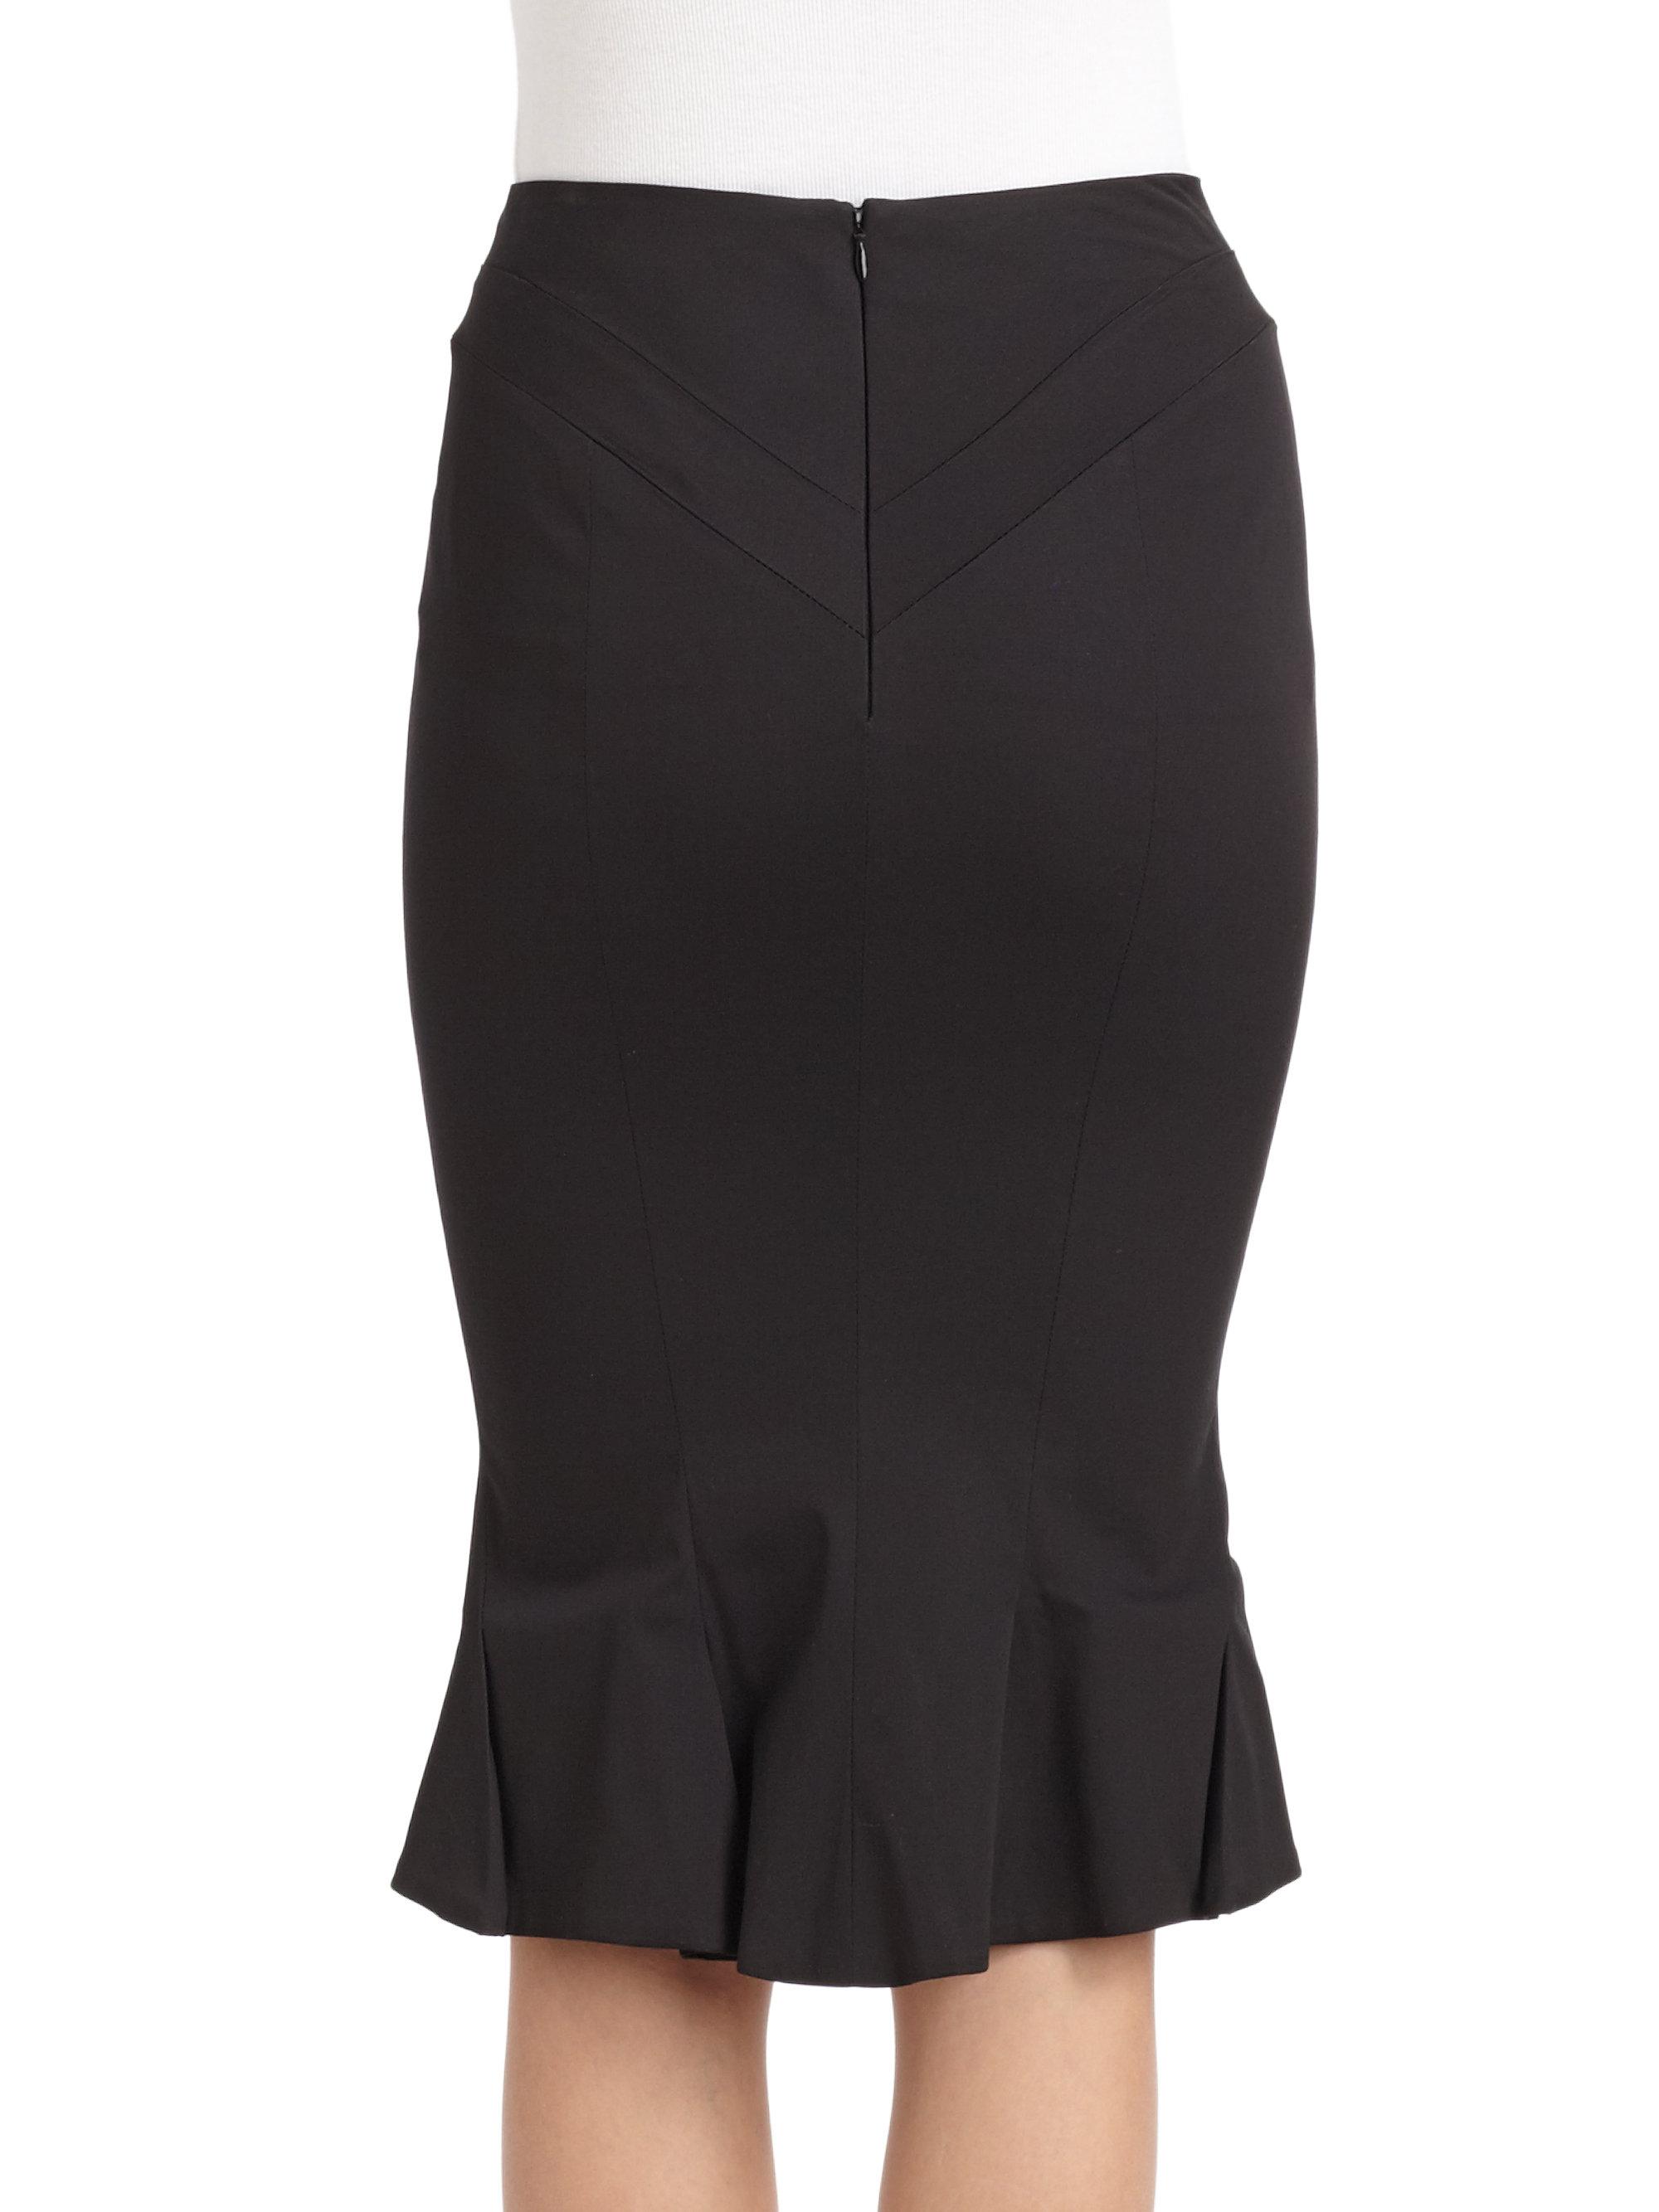 Zac posen Ruffle Back Pencil Skirt in Black | Lyst